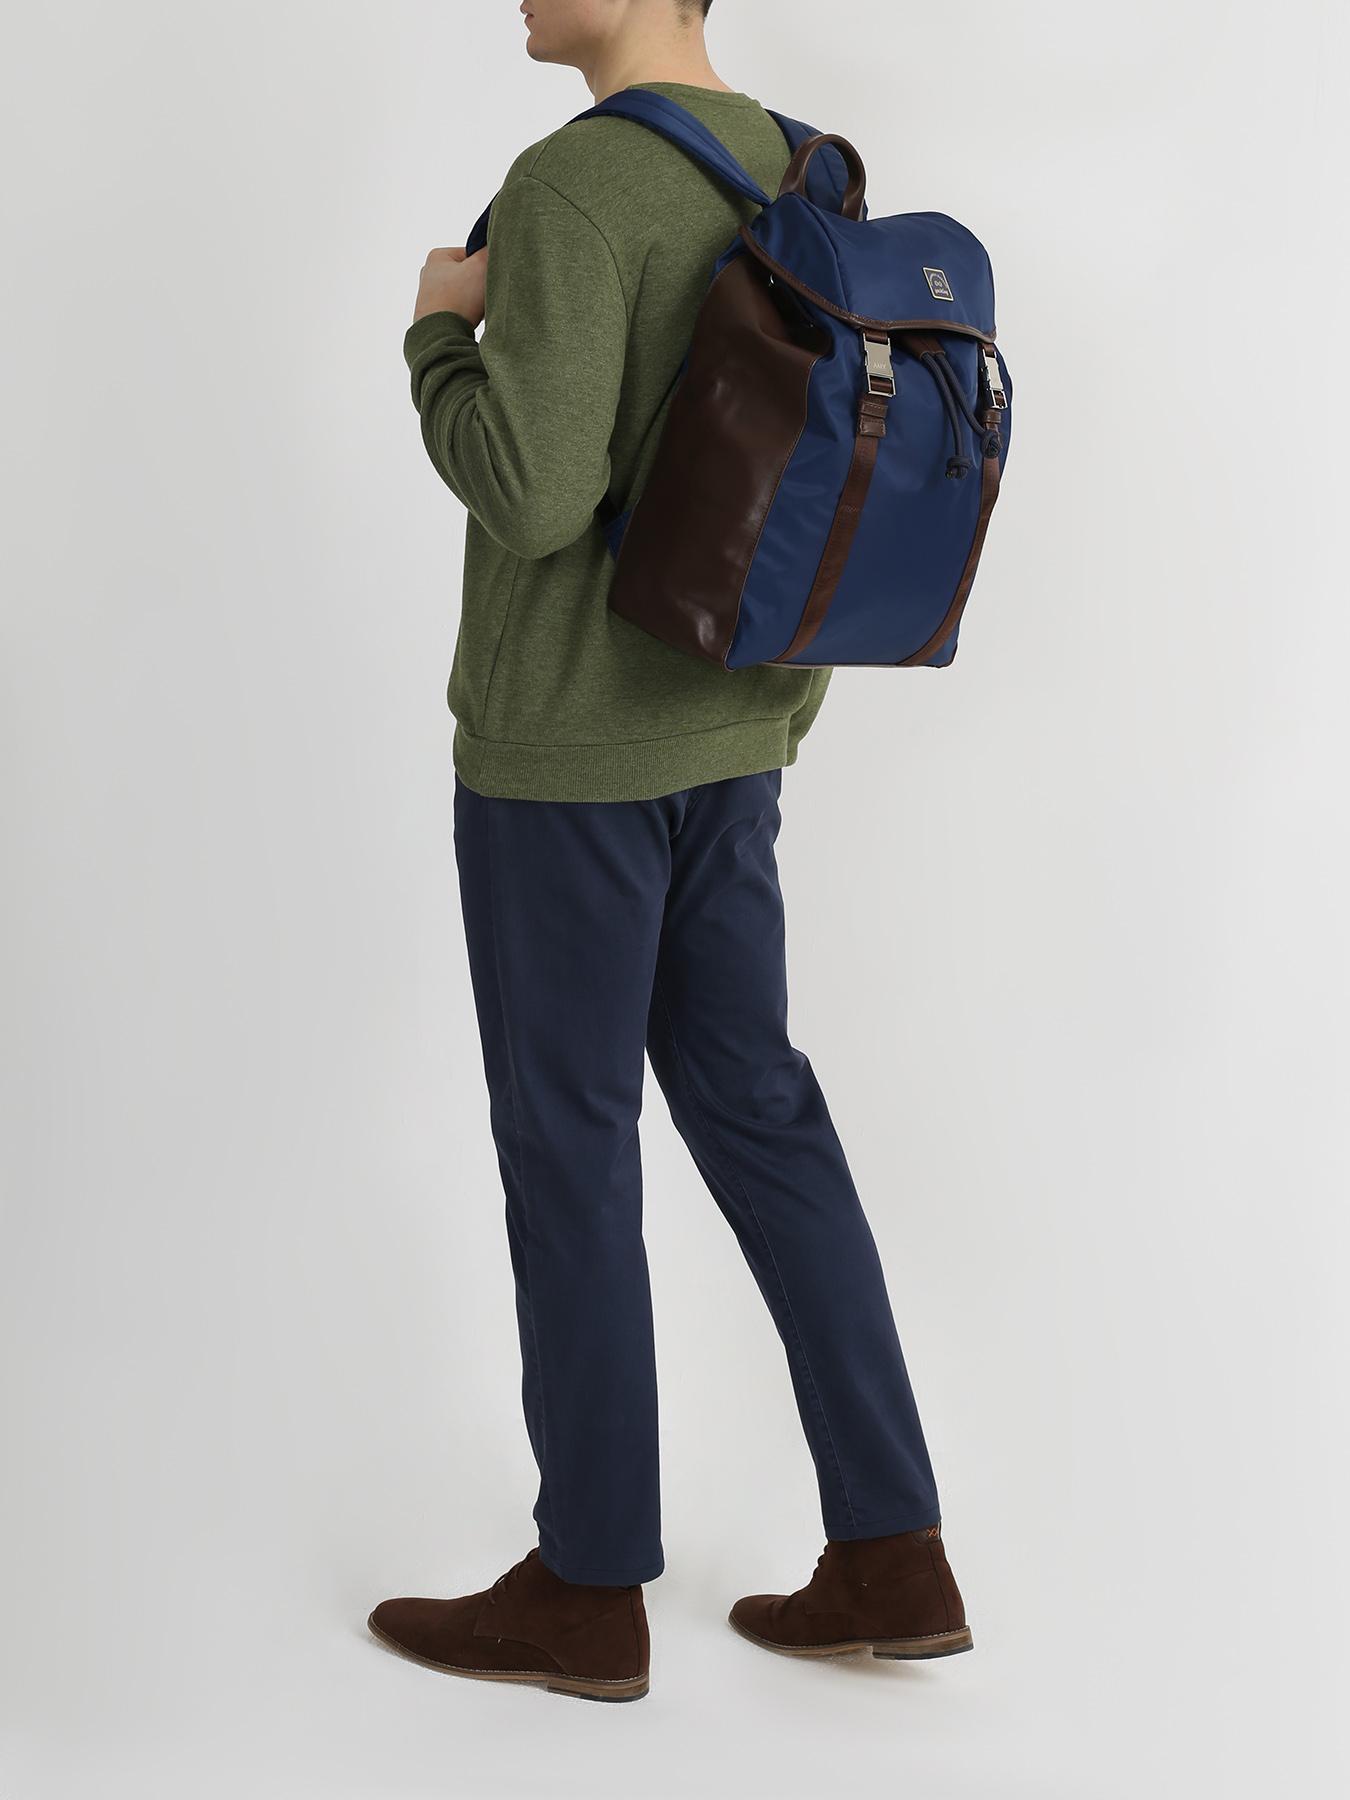 Рюкзак Alessandro Manzoni Yachting Мужской рюкзак рюкзак мужской vibe outca1813vi blu2